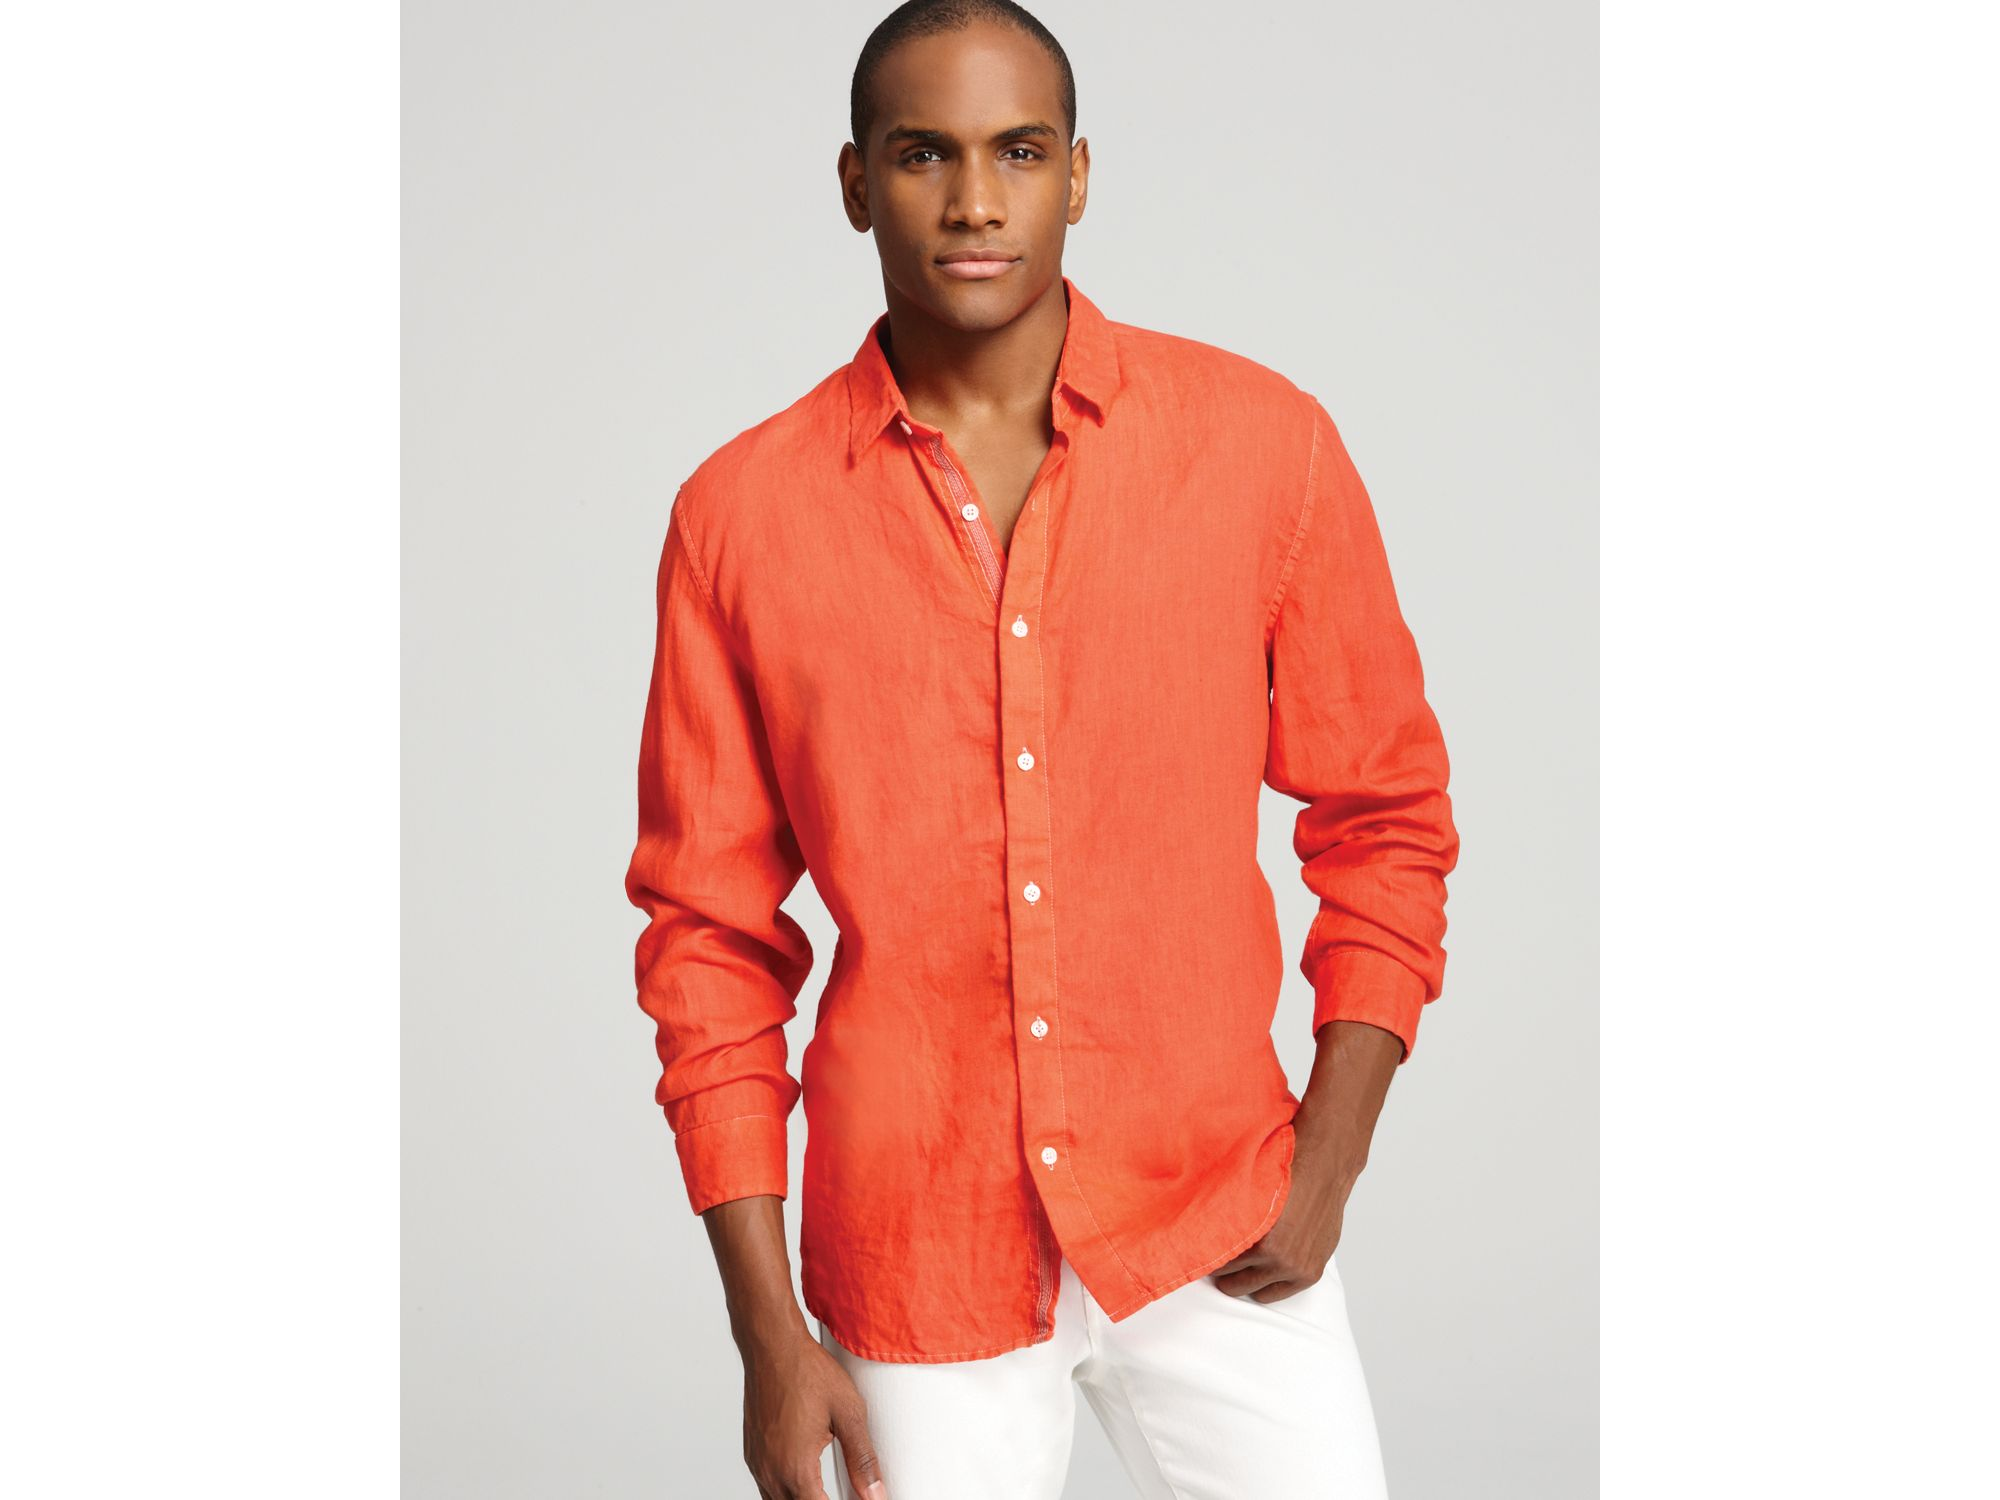 b2f2a5e1c2 Lyst - Elie Tahari Steve Linen Sport Shirt Classic Fit in Orange for Men